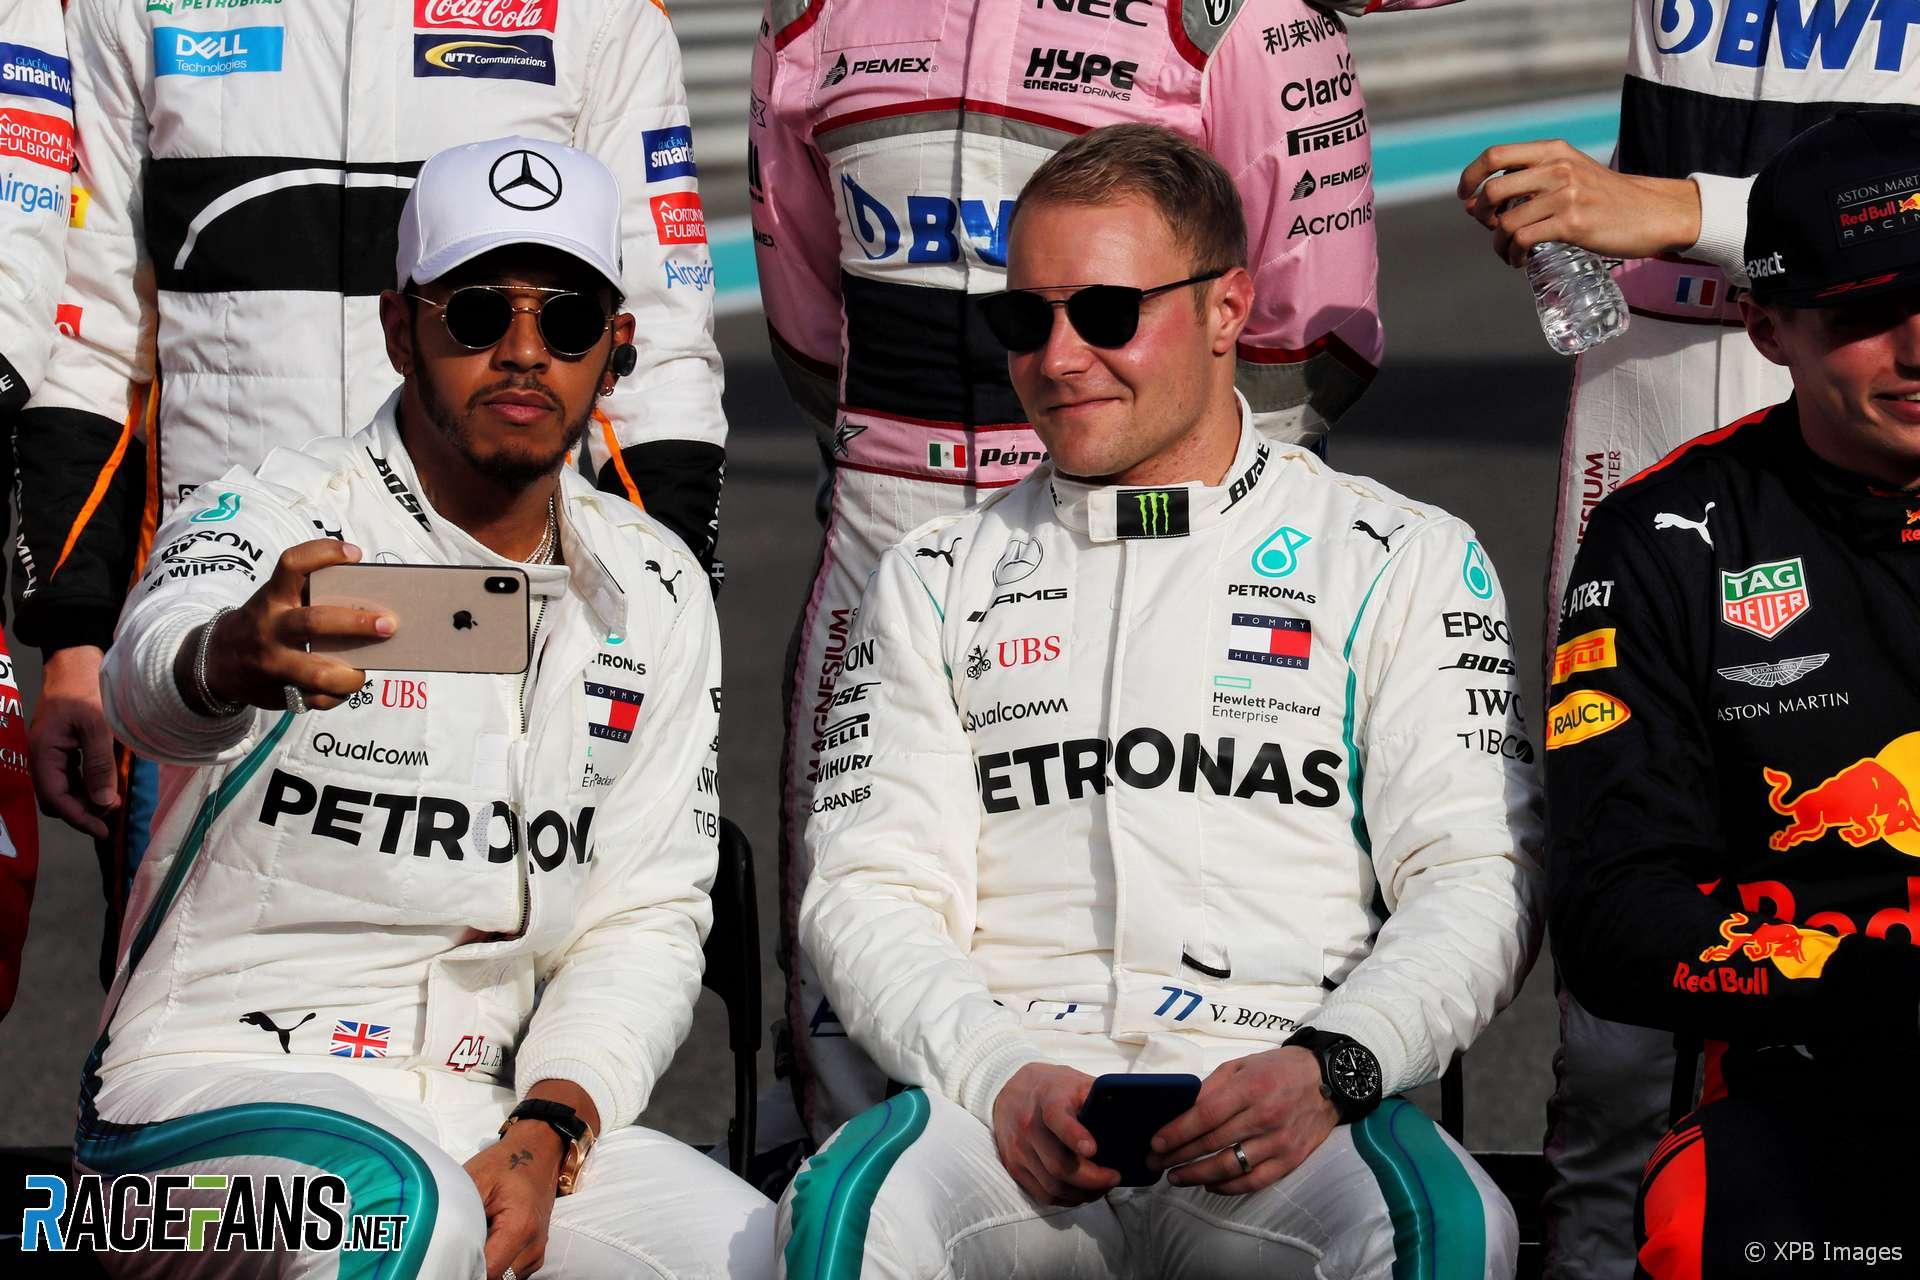 Lewis Hamilton, Valtteri Bottas, Mercedes, Yas Marina, 2018